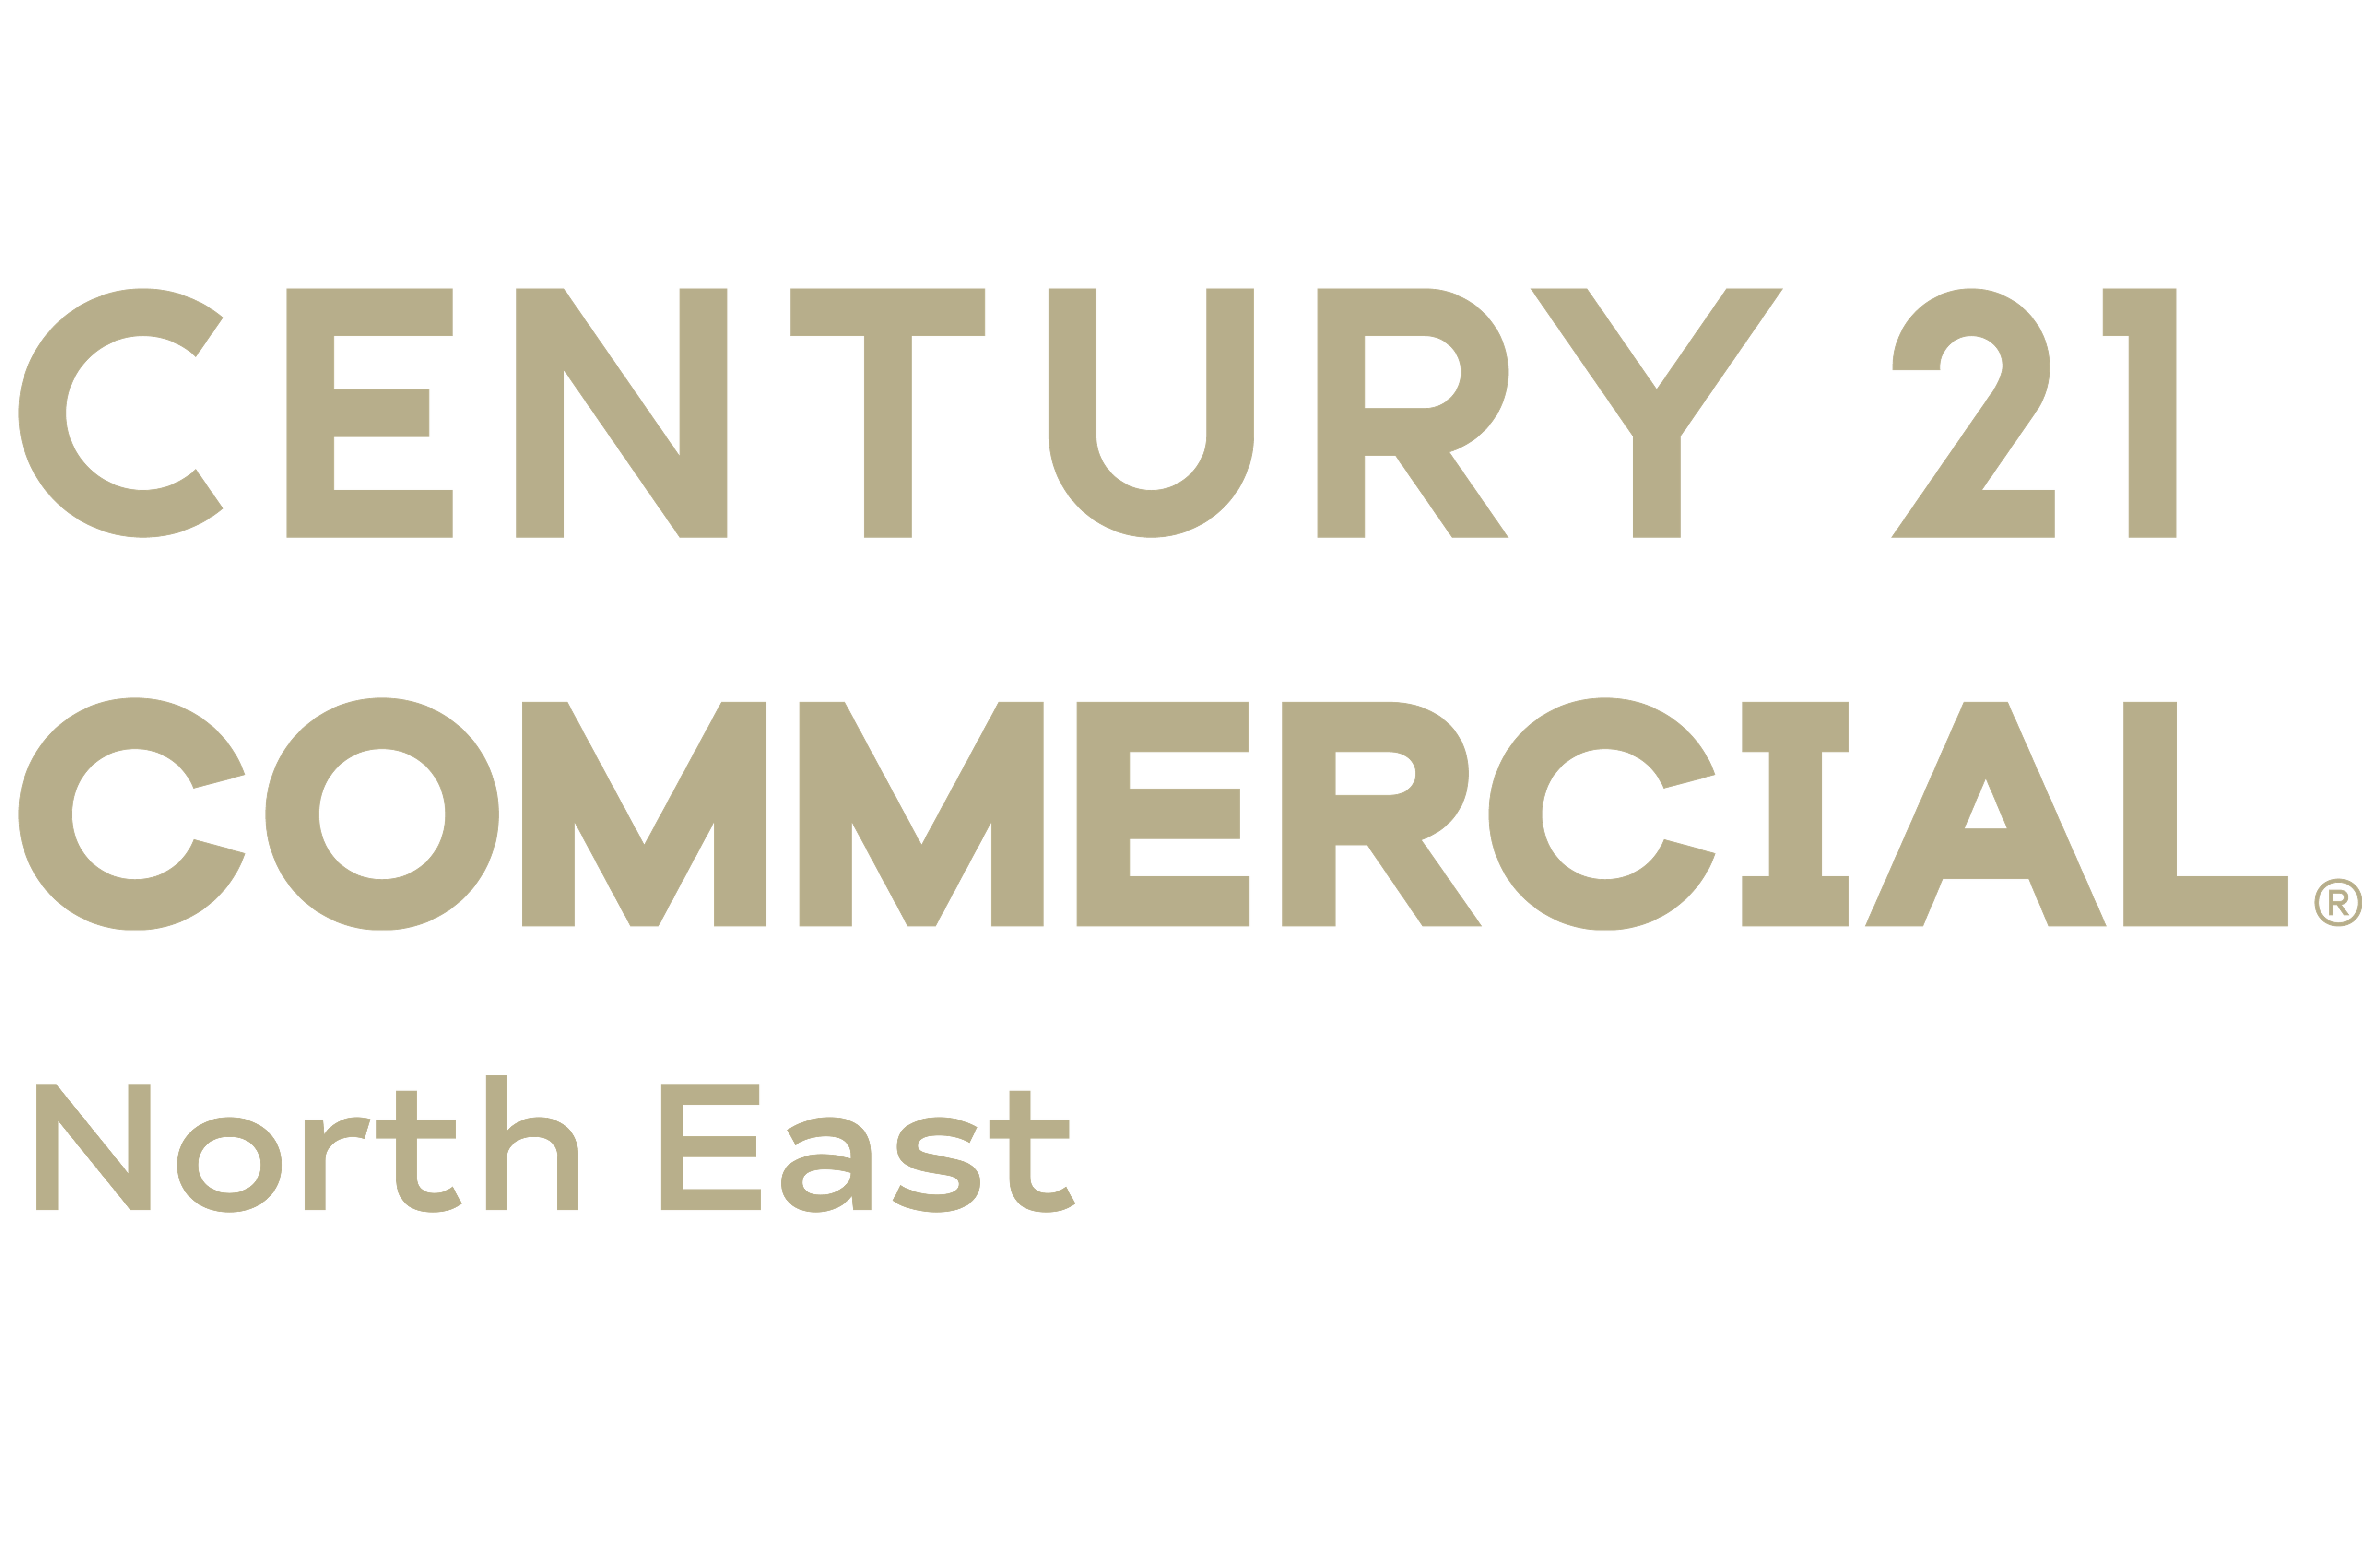 CENTURY 21 North East